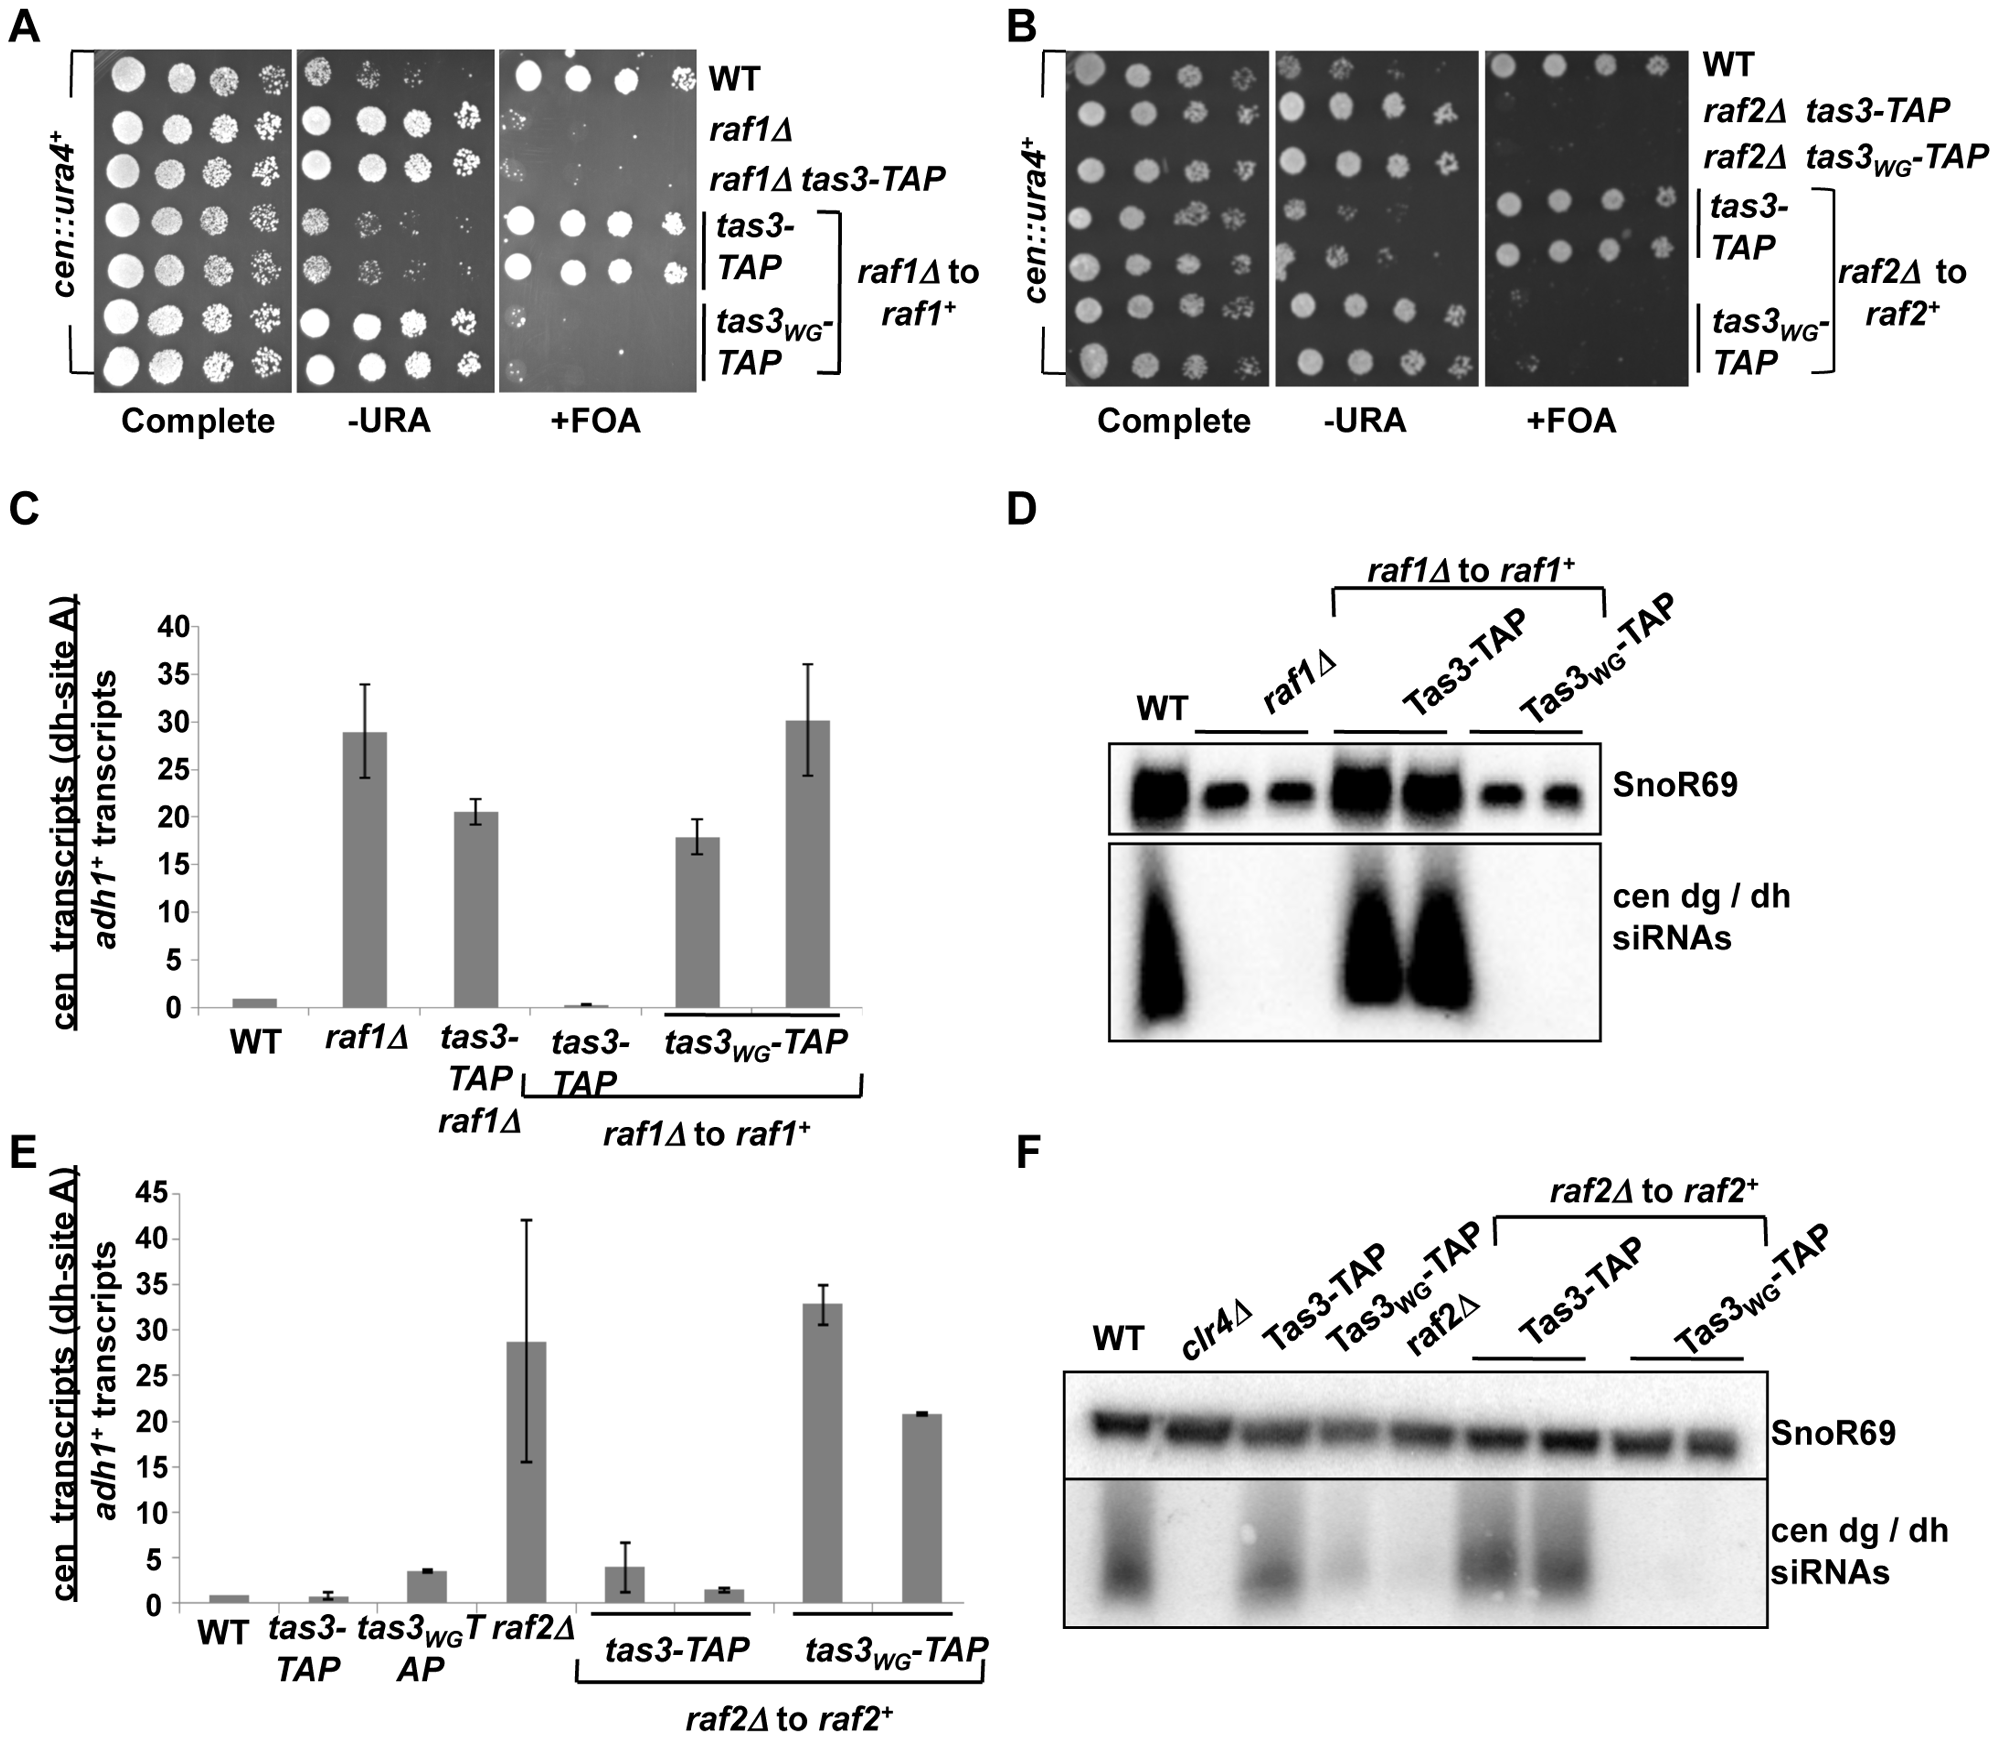 Clr-C components <i>raf1<sup>+</sup></i> and <i>raf2<sup>+</sup></i> facilitate establishment of repressive centromeric heterochromatin.